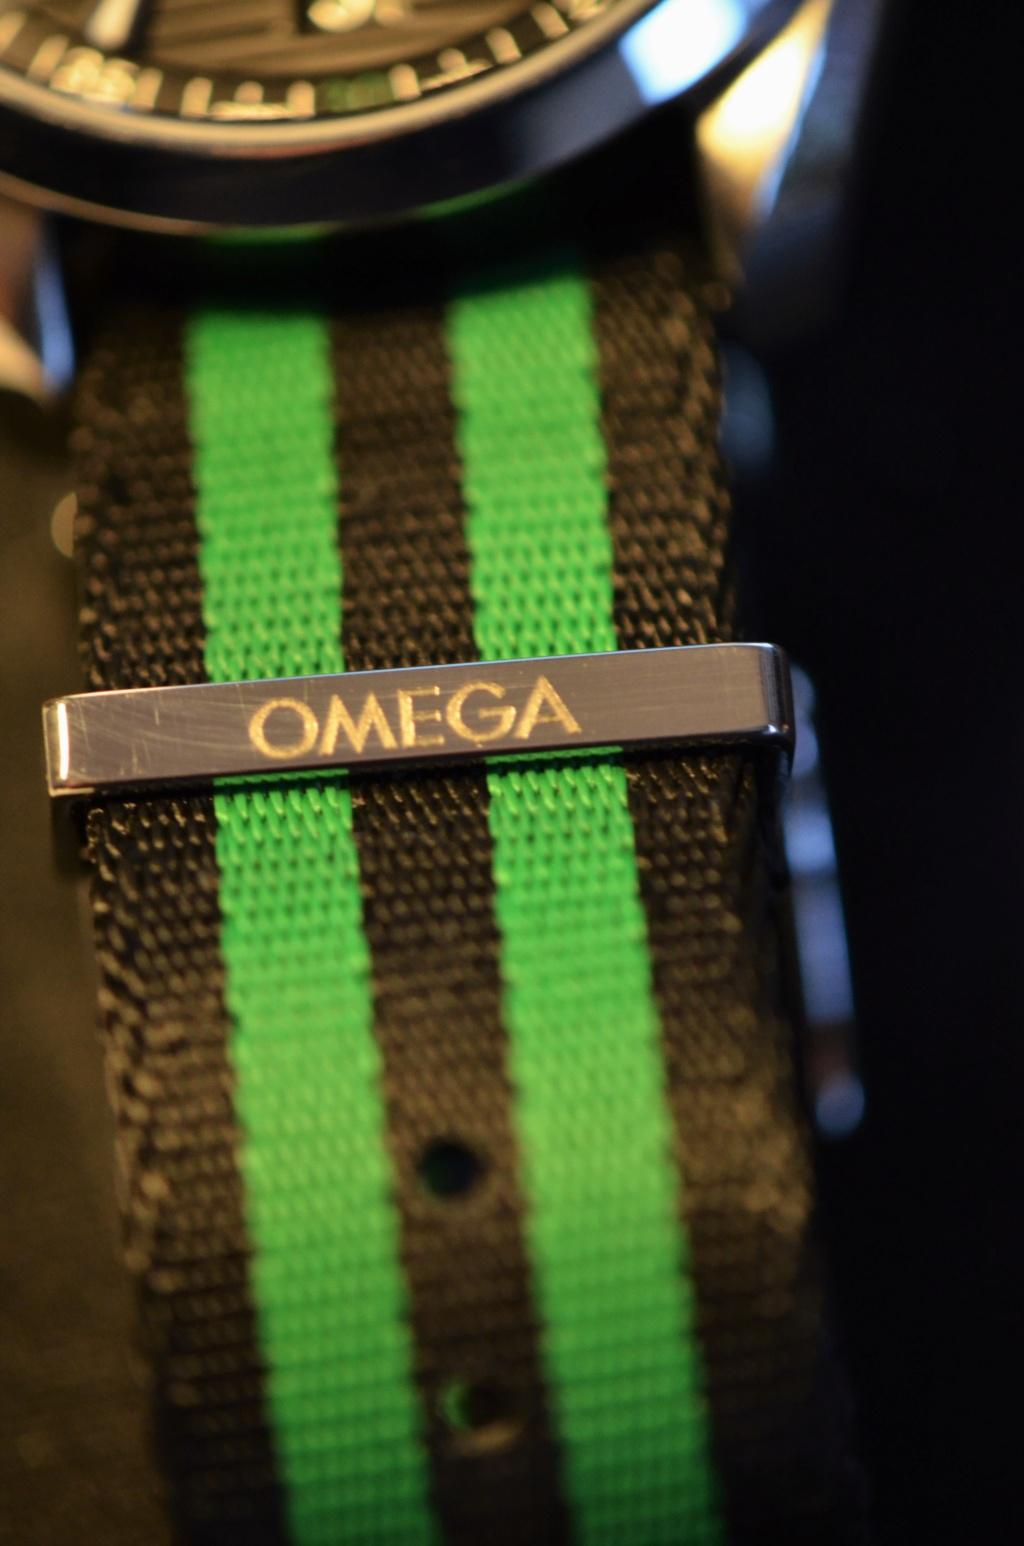 seamaster - [Vends] Omega Seamaster Aqua Terra Golf Black Dsc_0010